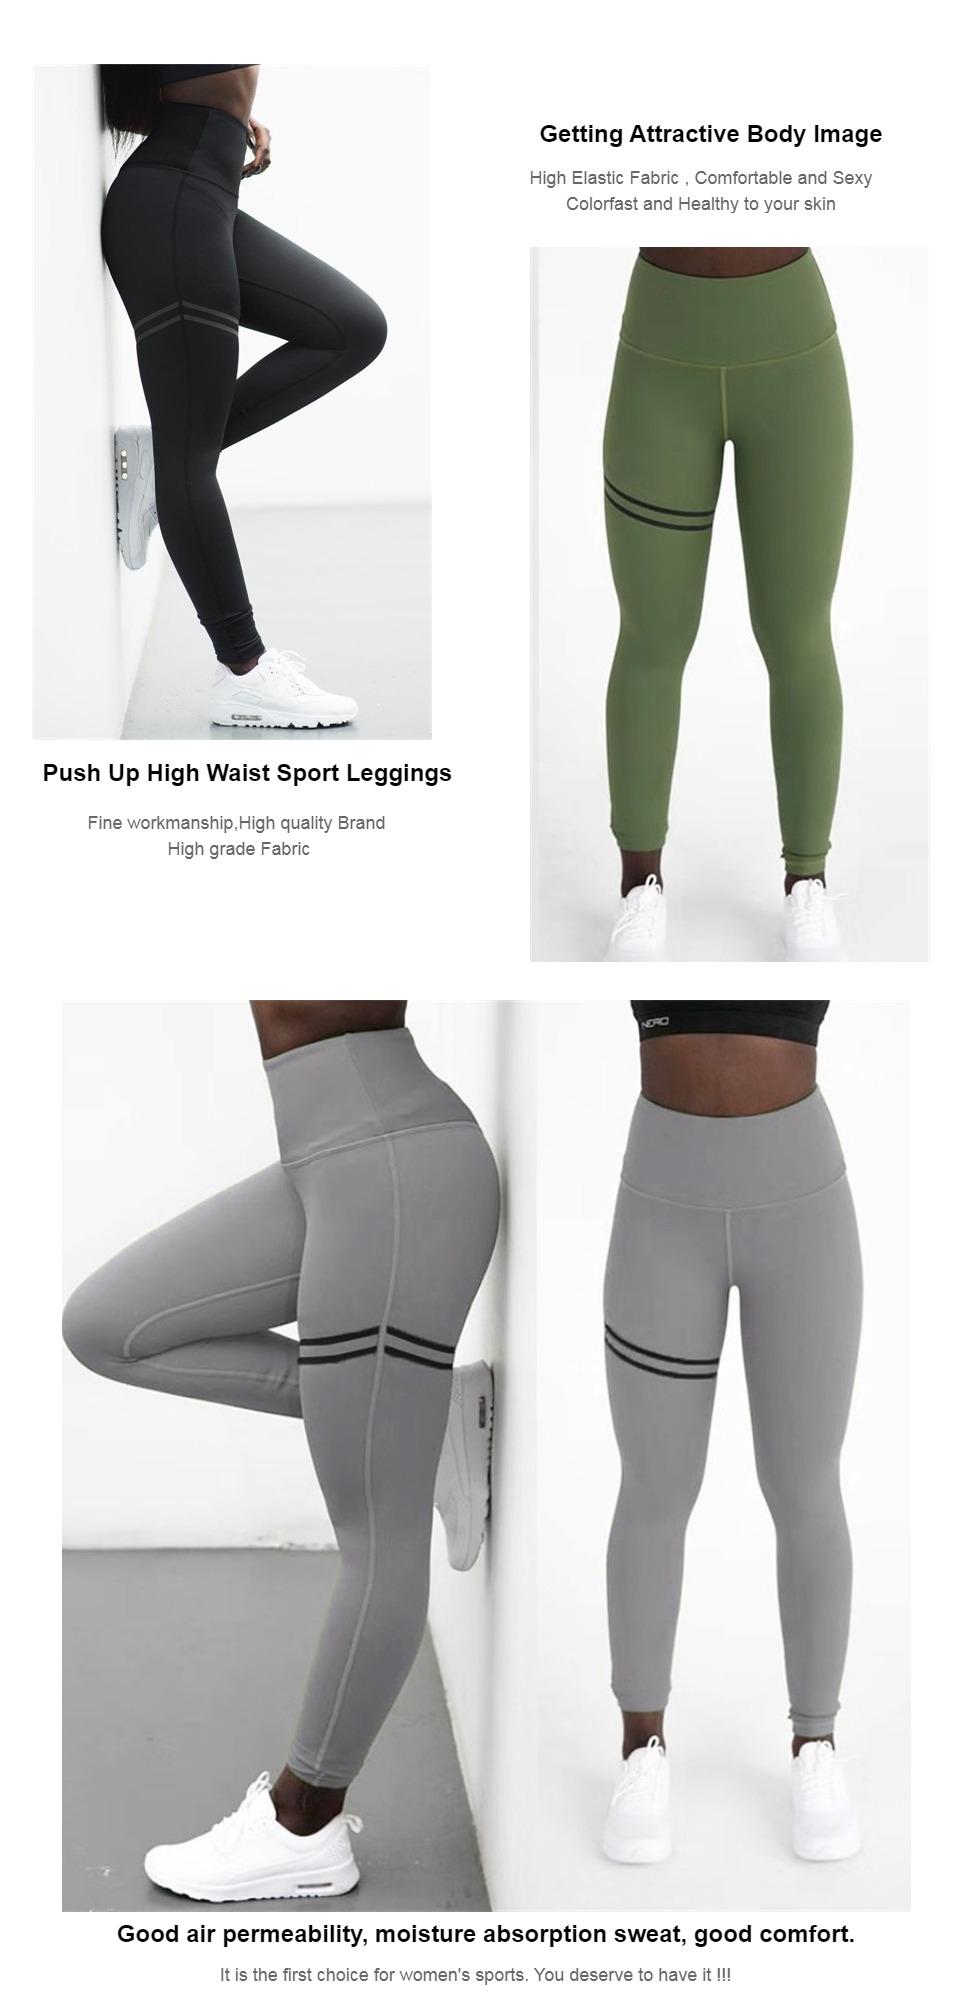 Sports ware for women   Leggings   Sexy Leggings   Yoga Pants   Sexy Yoga Pants   Gym ware for Women    Fashionable Leggings   Push-up Leggings   Workout Leggings   Slim Leggings   V-Waist Leggings   Women Pencil Pants